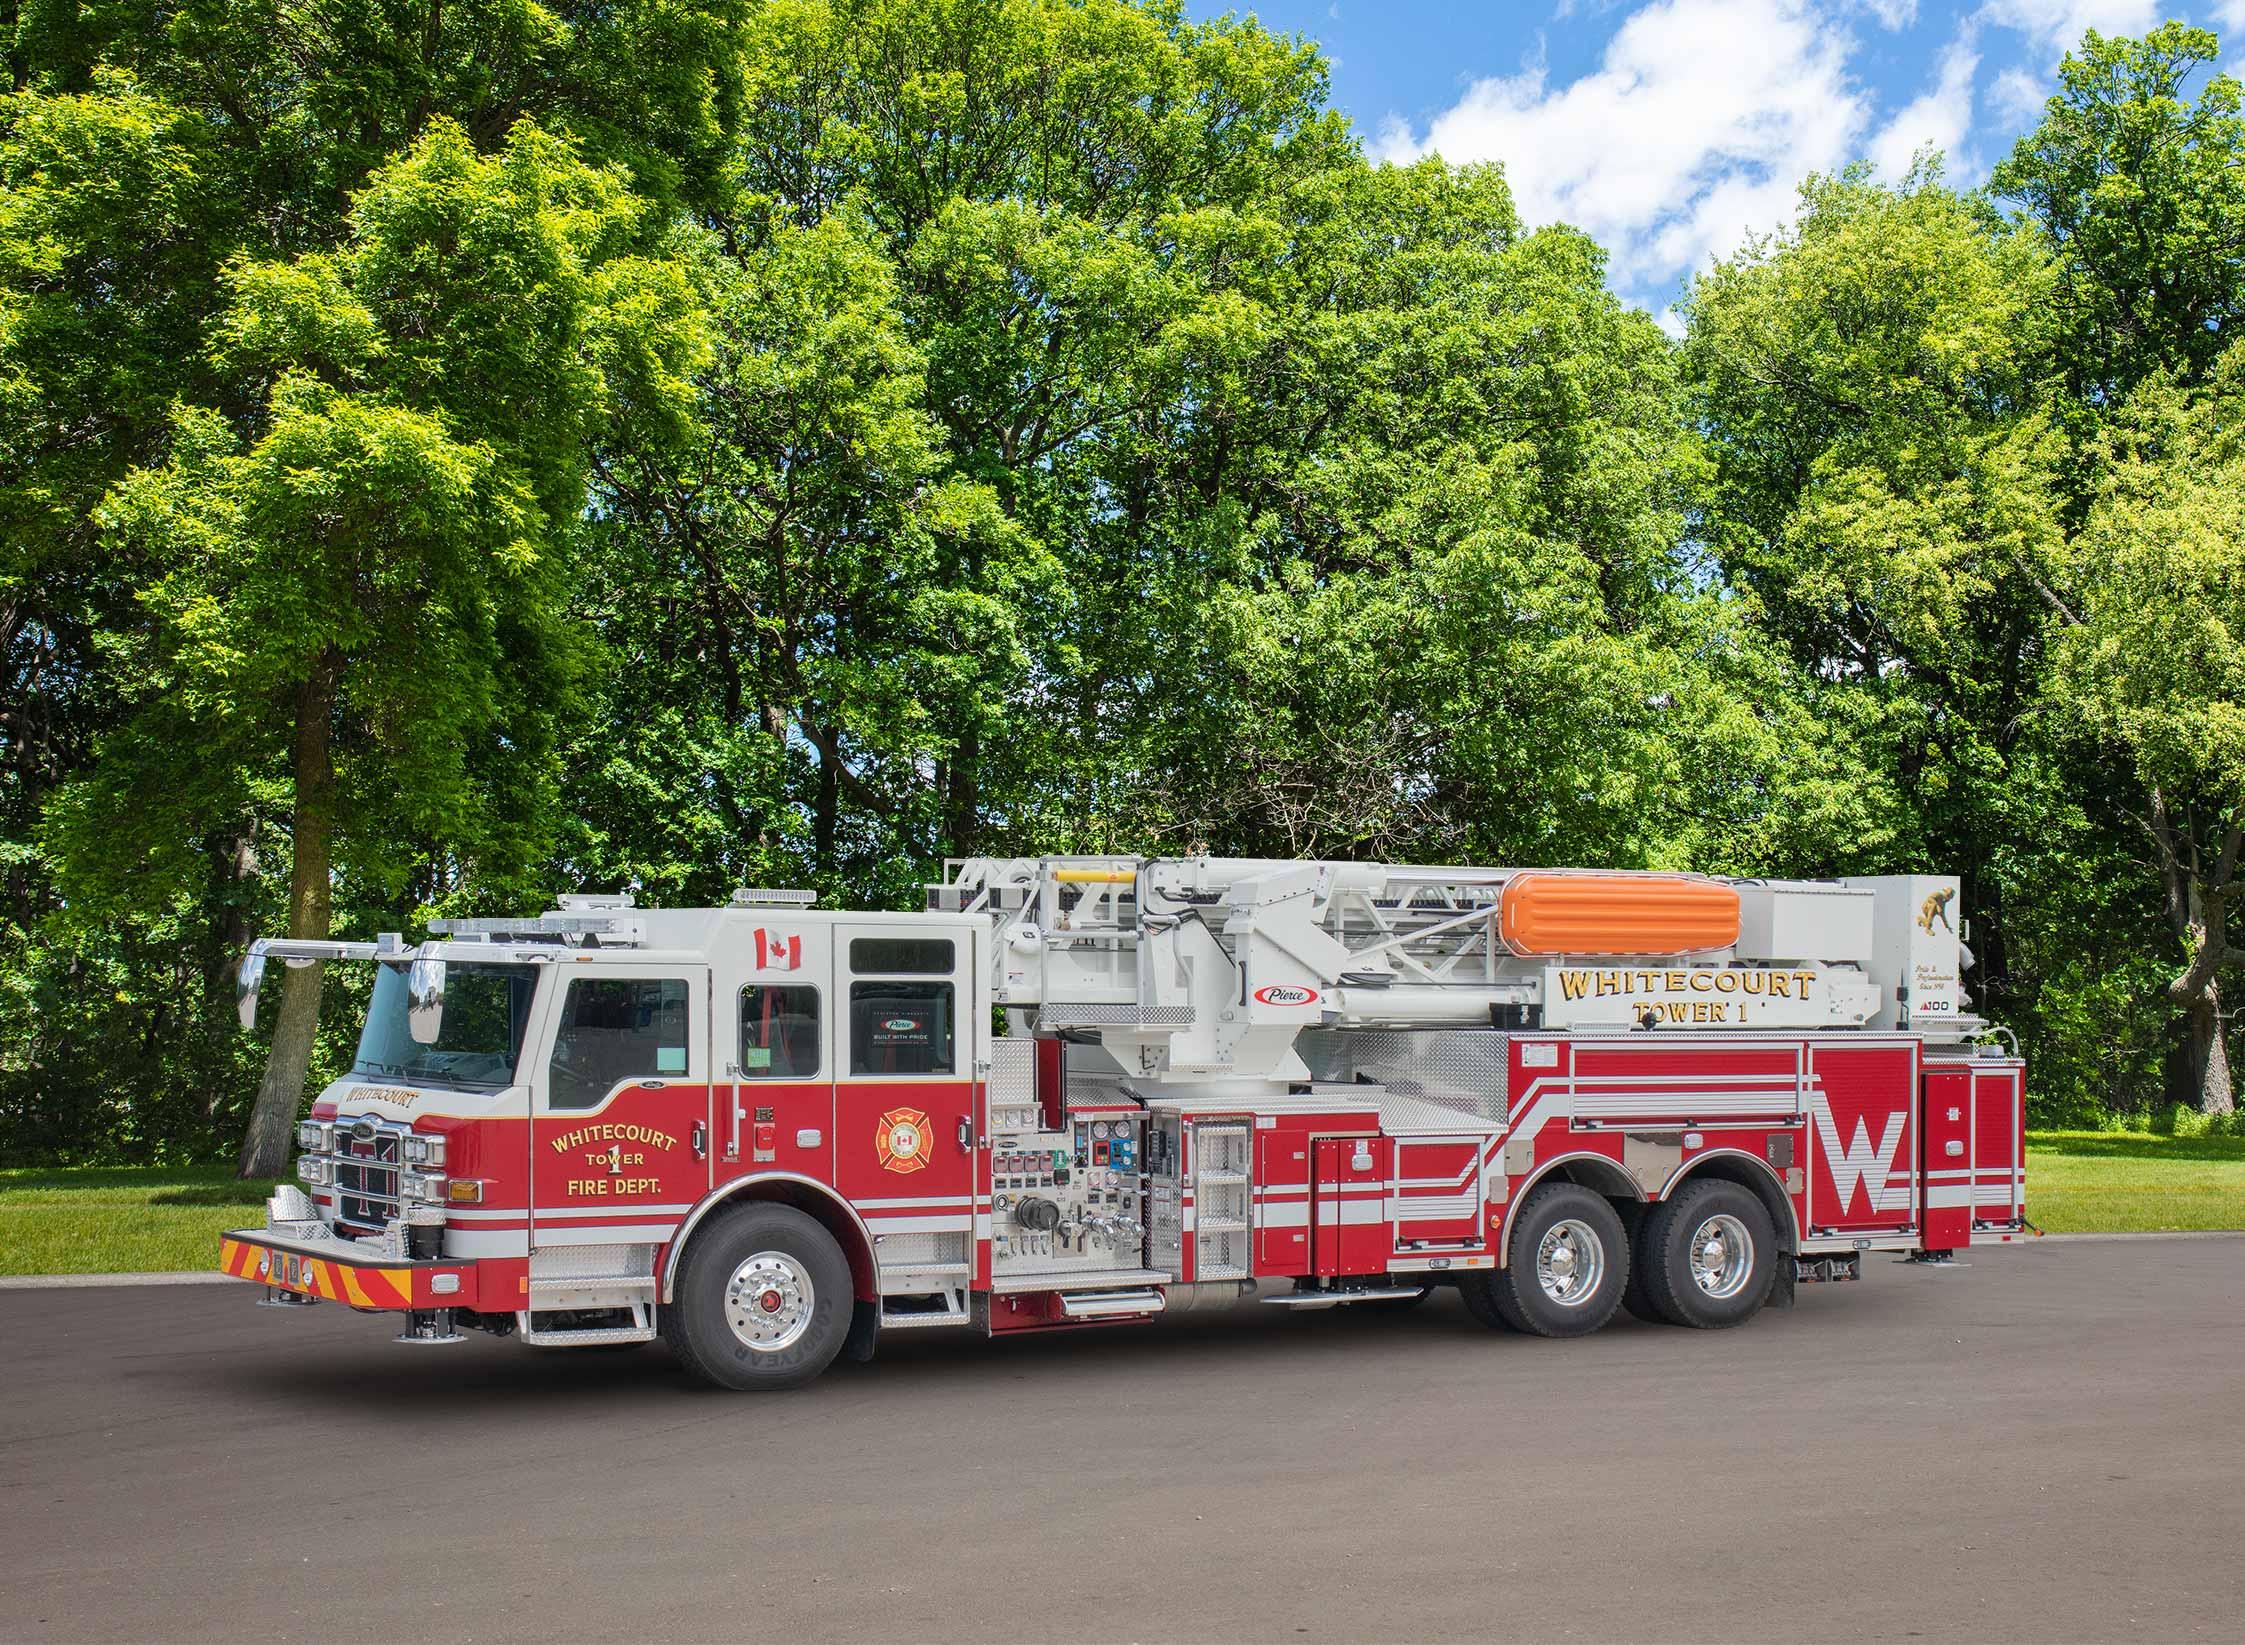 Whitecourt Fire Department - Aerial